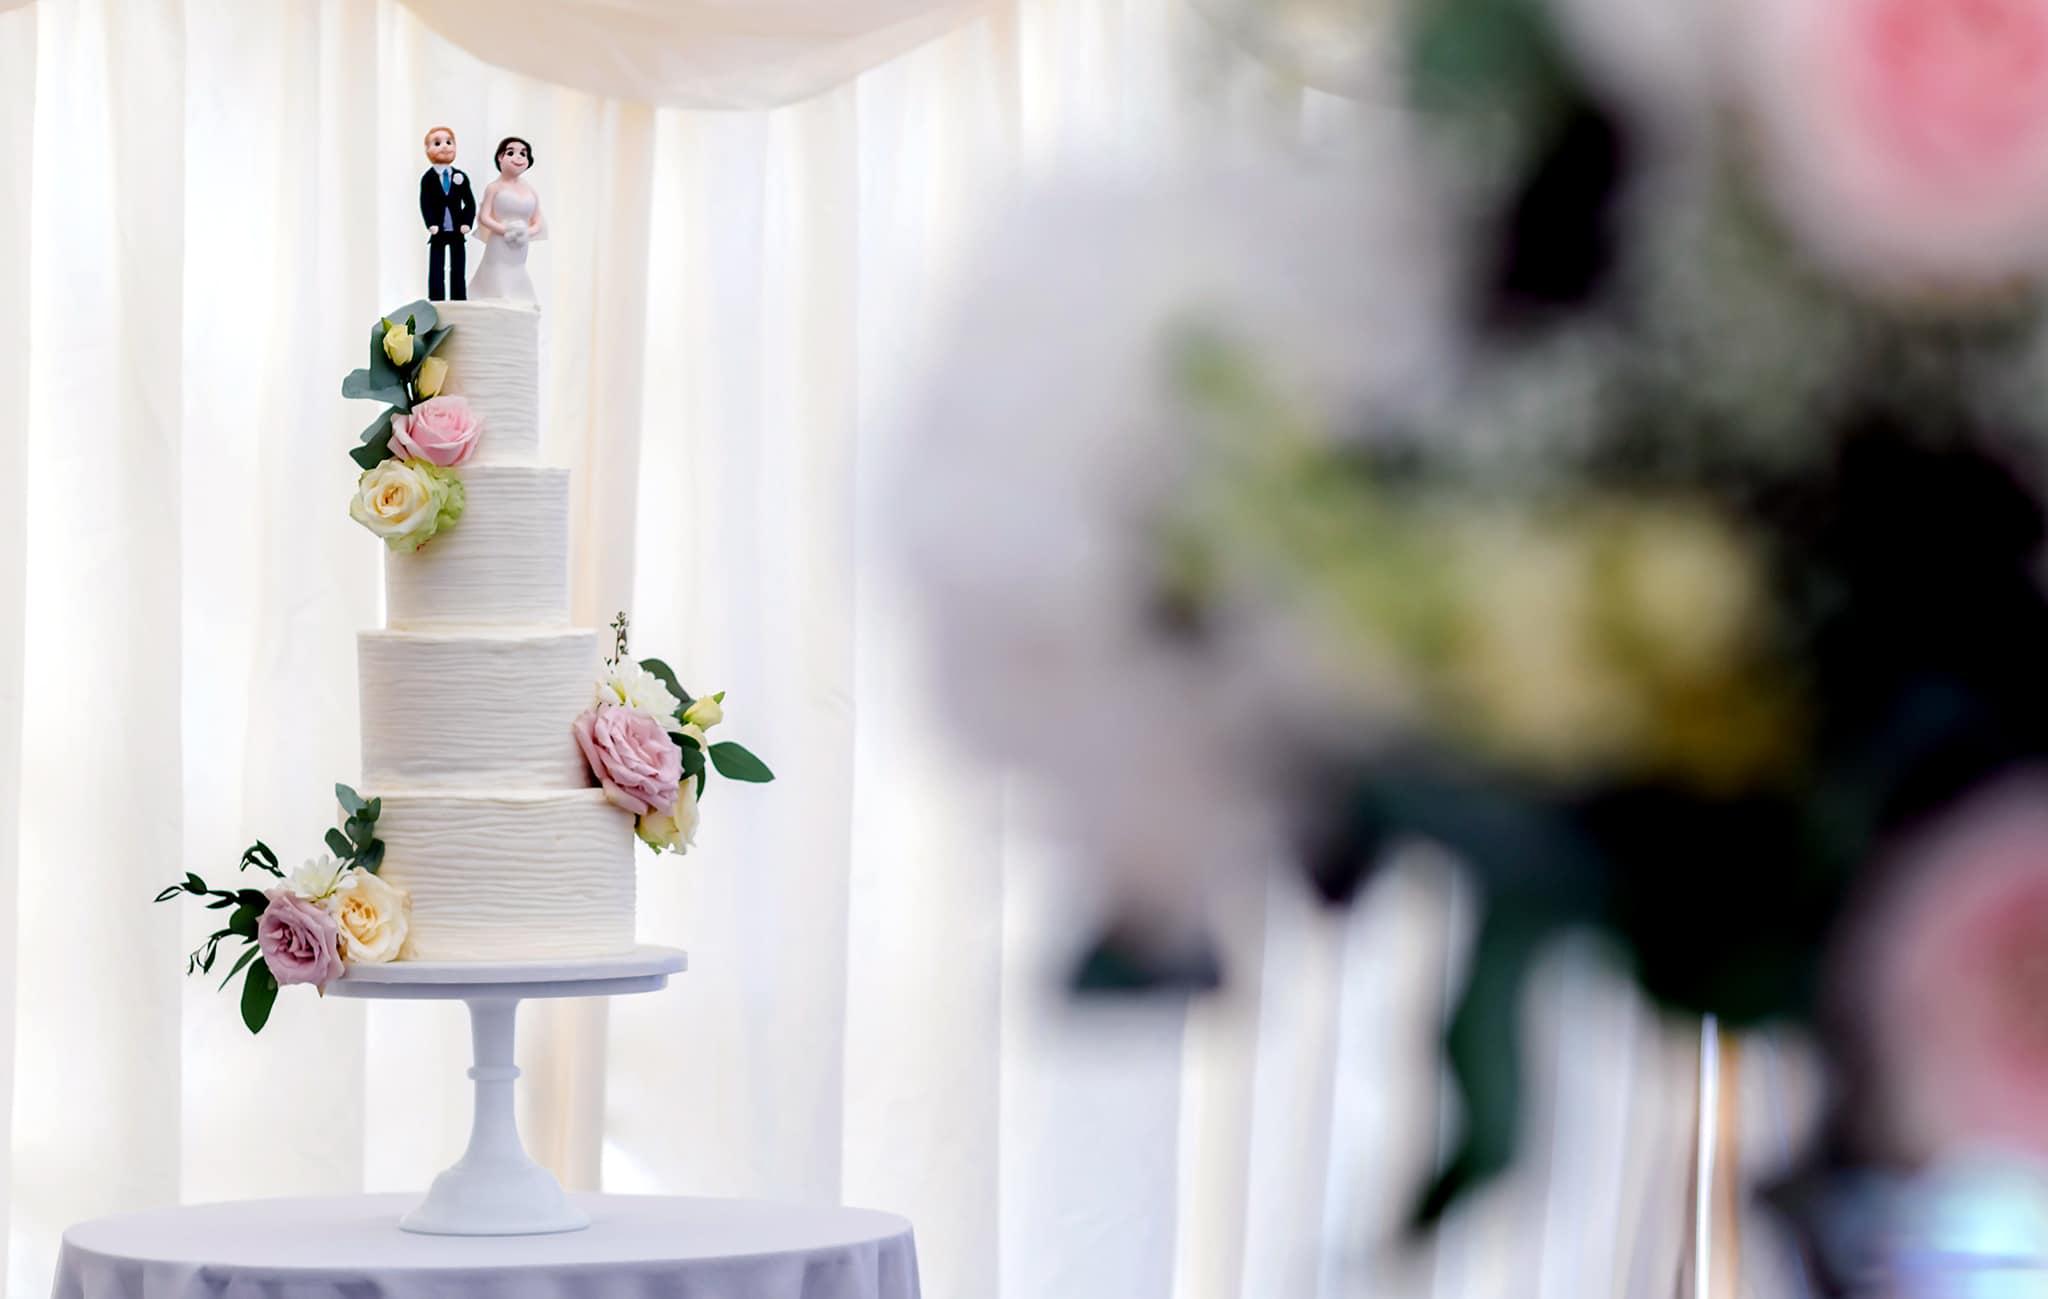 Fonmon castle wedding cake